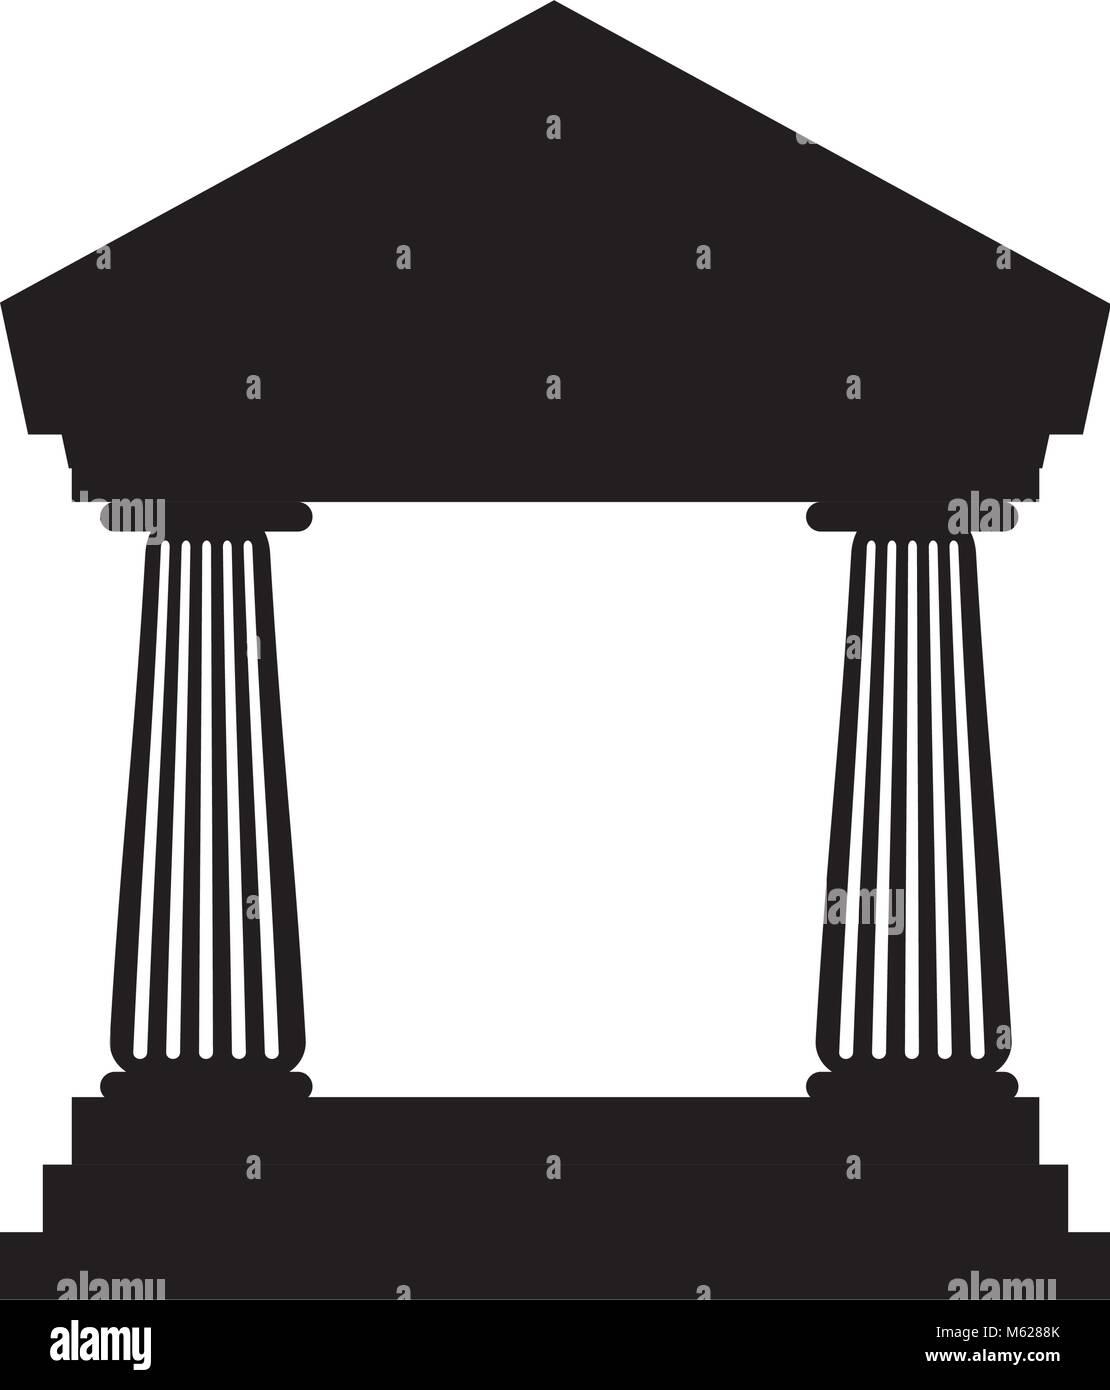 Bank building symbol icon vector illustration graphic design - Stock Vector